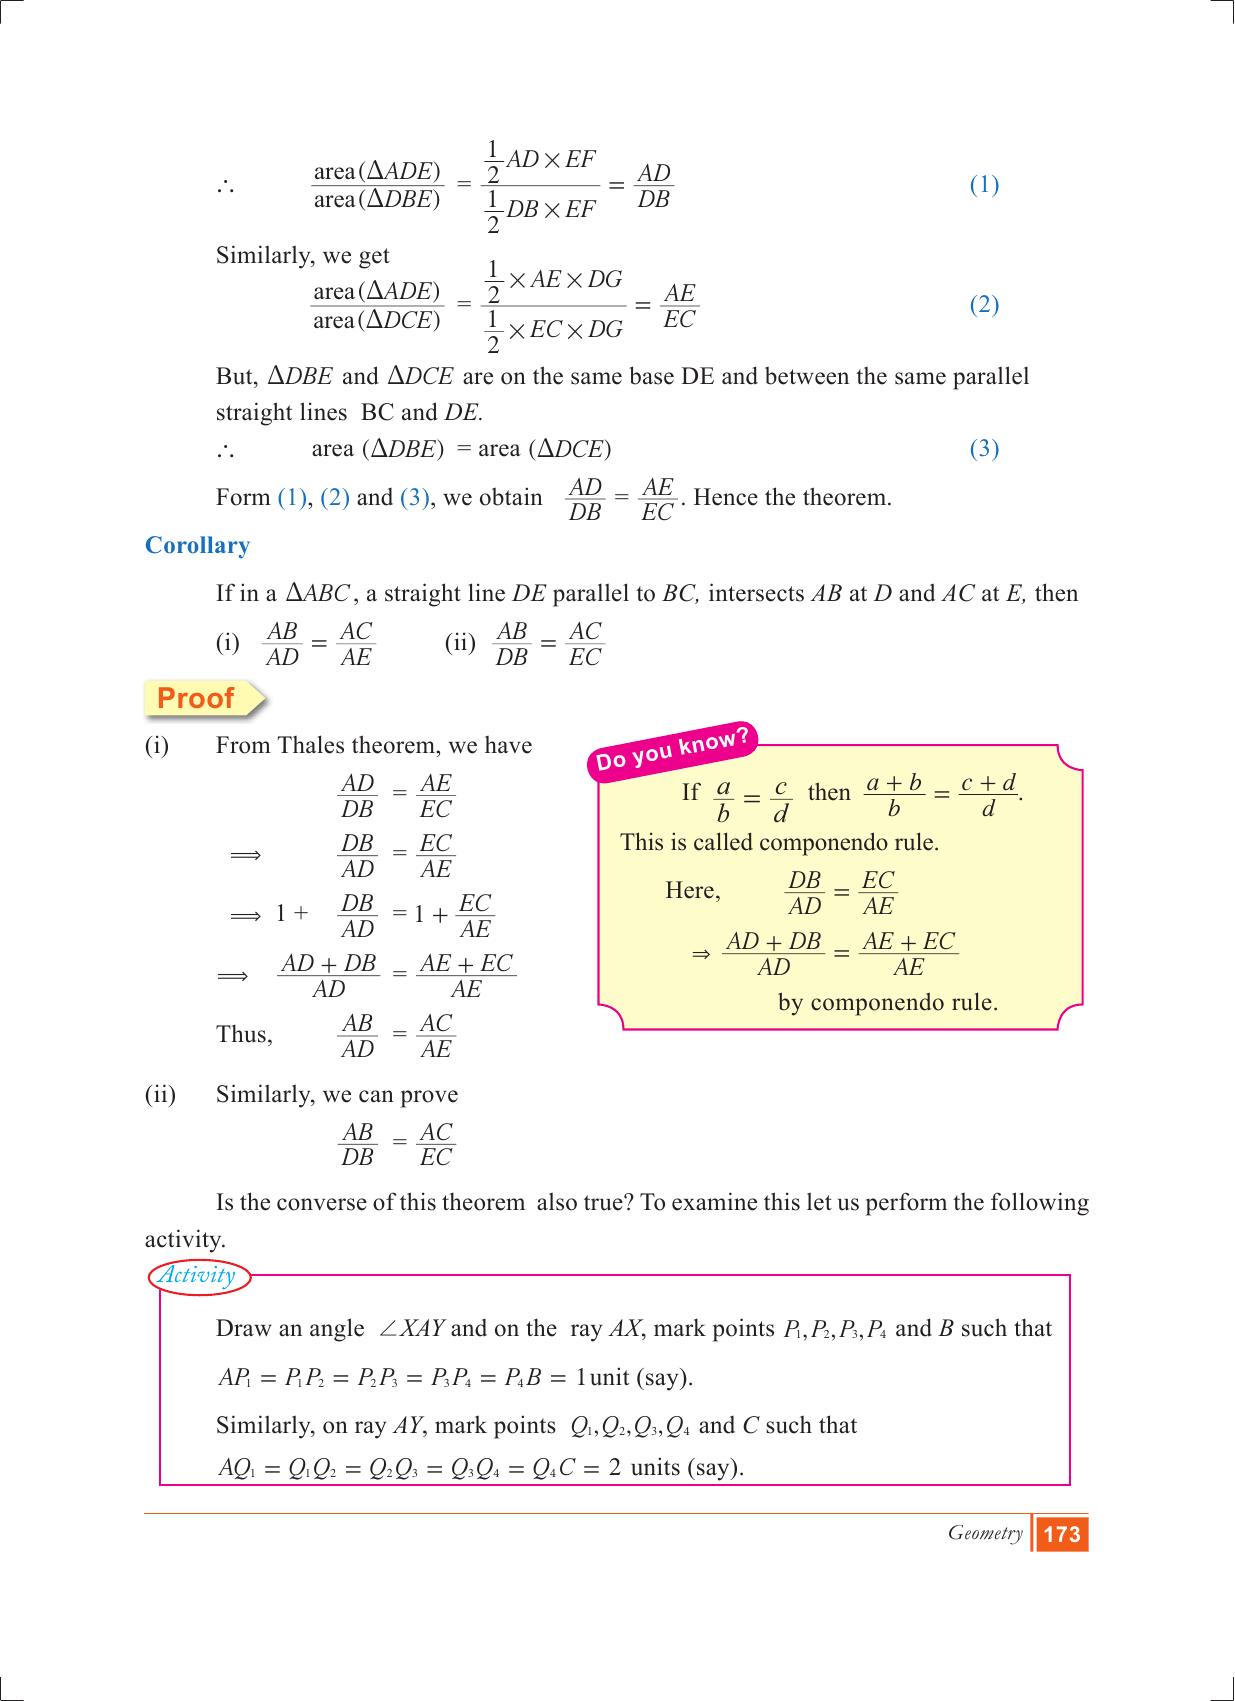 Mathematics Grade 11 Past Papers